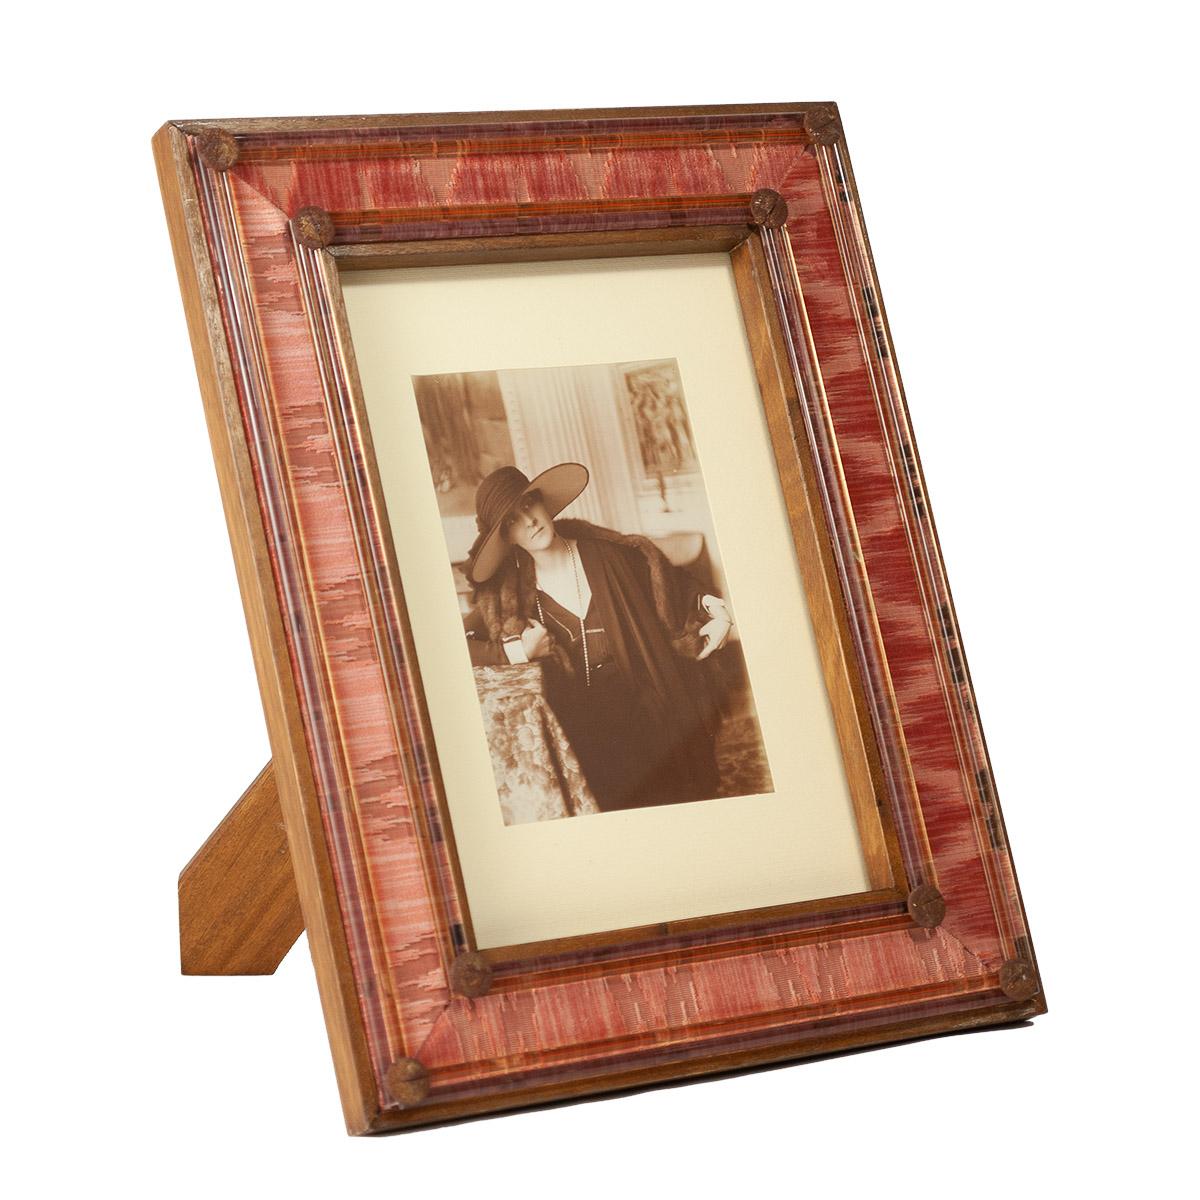 madda-frame-design-giberto-murano-venice-luxury-pink-photo